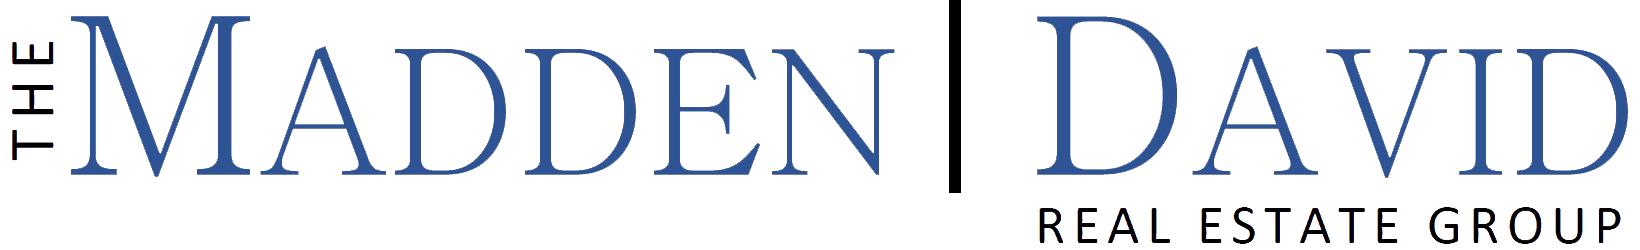 Madden David Logo